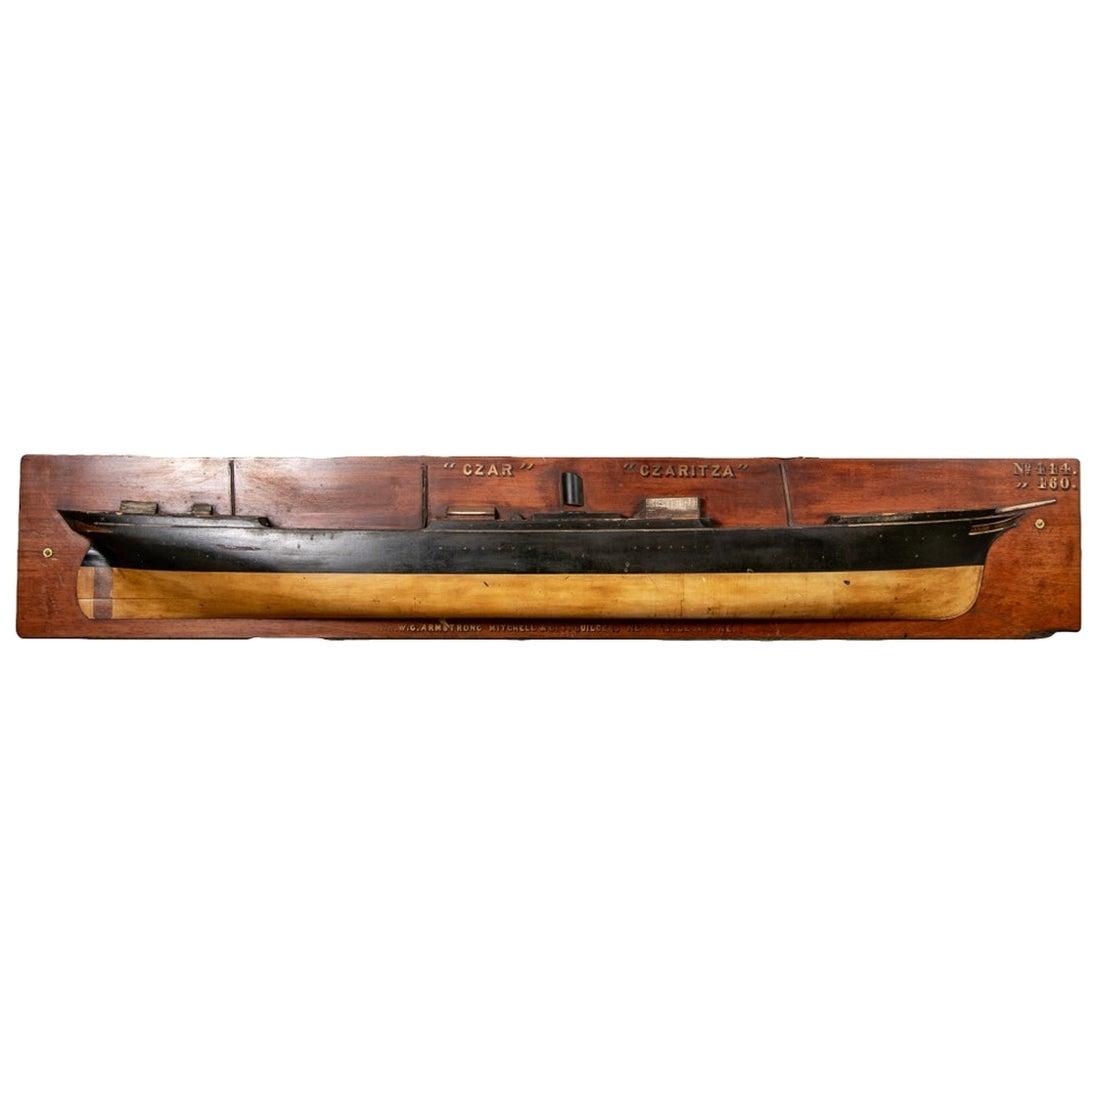 Massive Antique Half Hull Ship Model